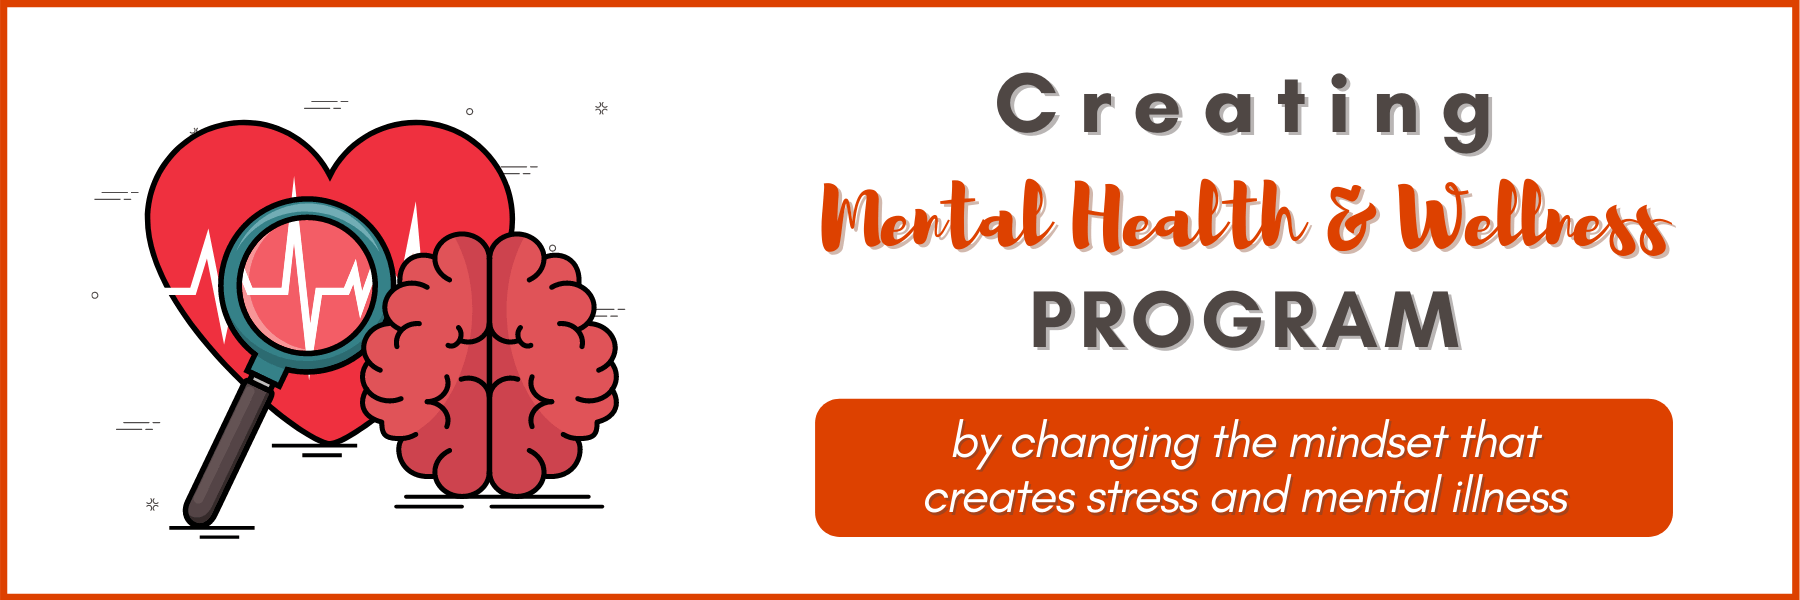 Creating Mental Health and Wellness Program - Caliber